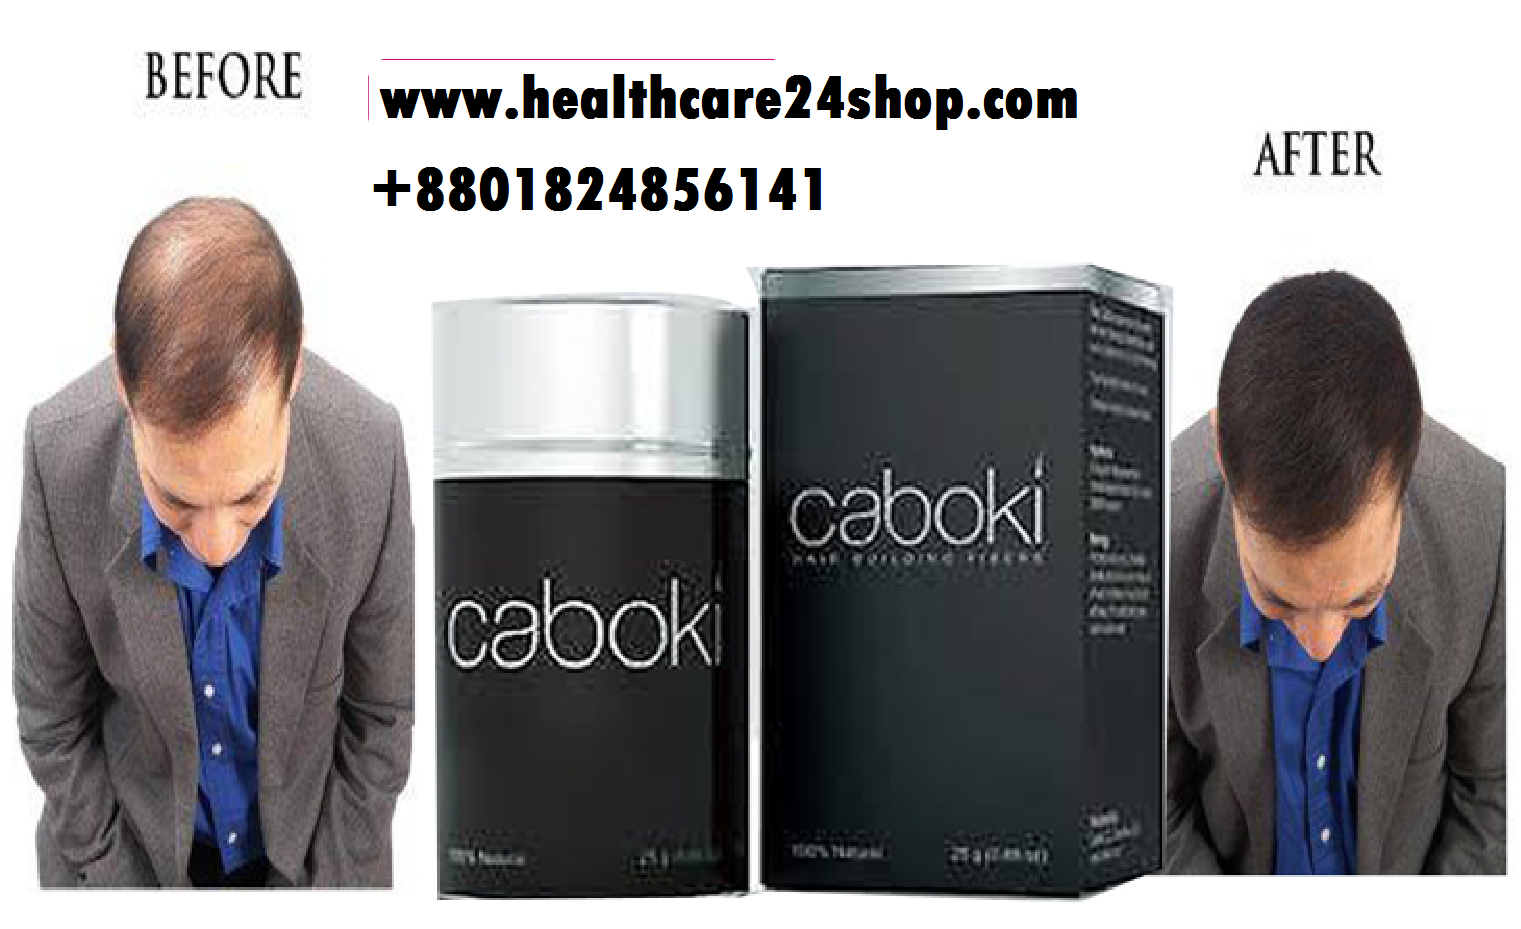 Original Caboki Hair Building Fibers 25g Instant Growth Fiber Usa Loss Treatment